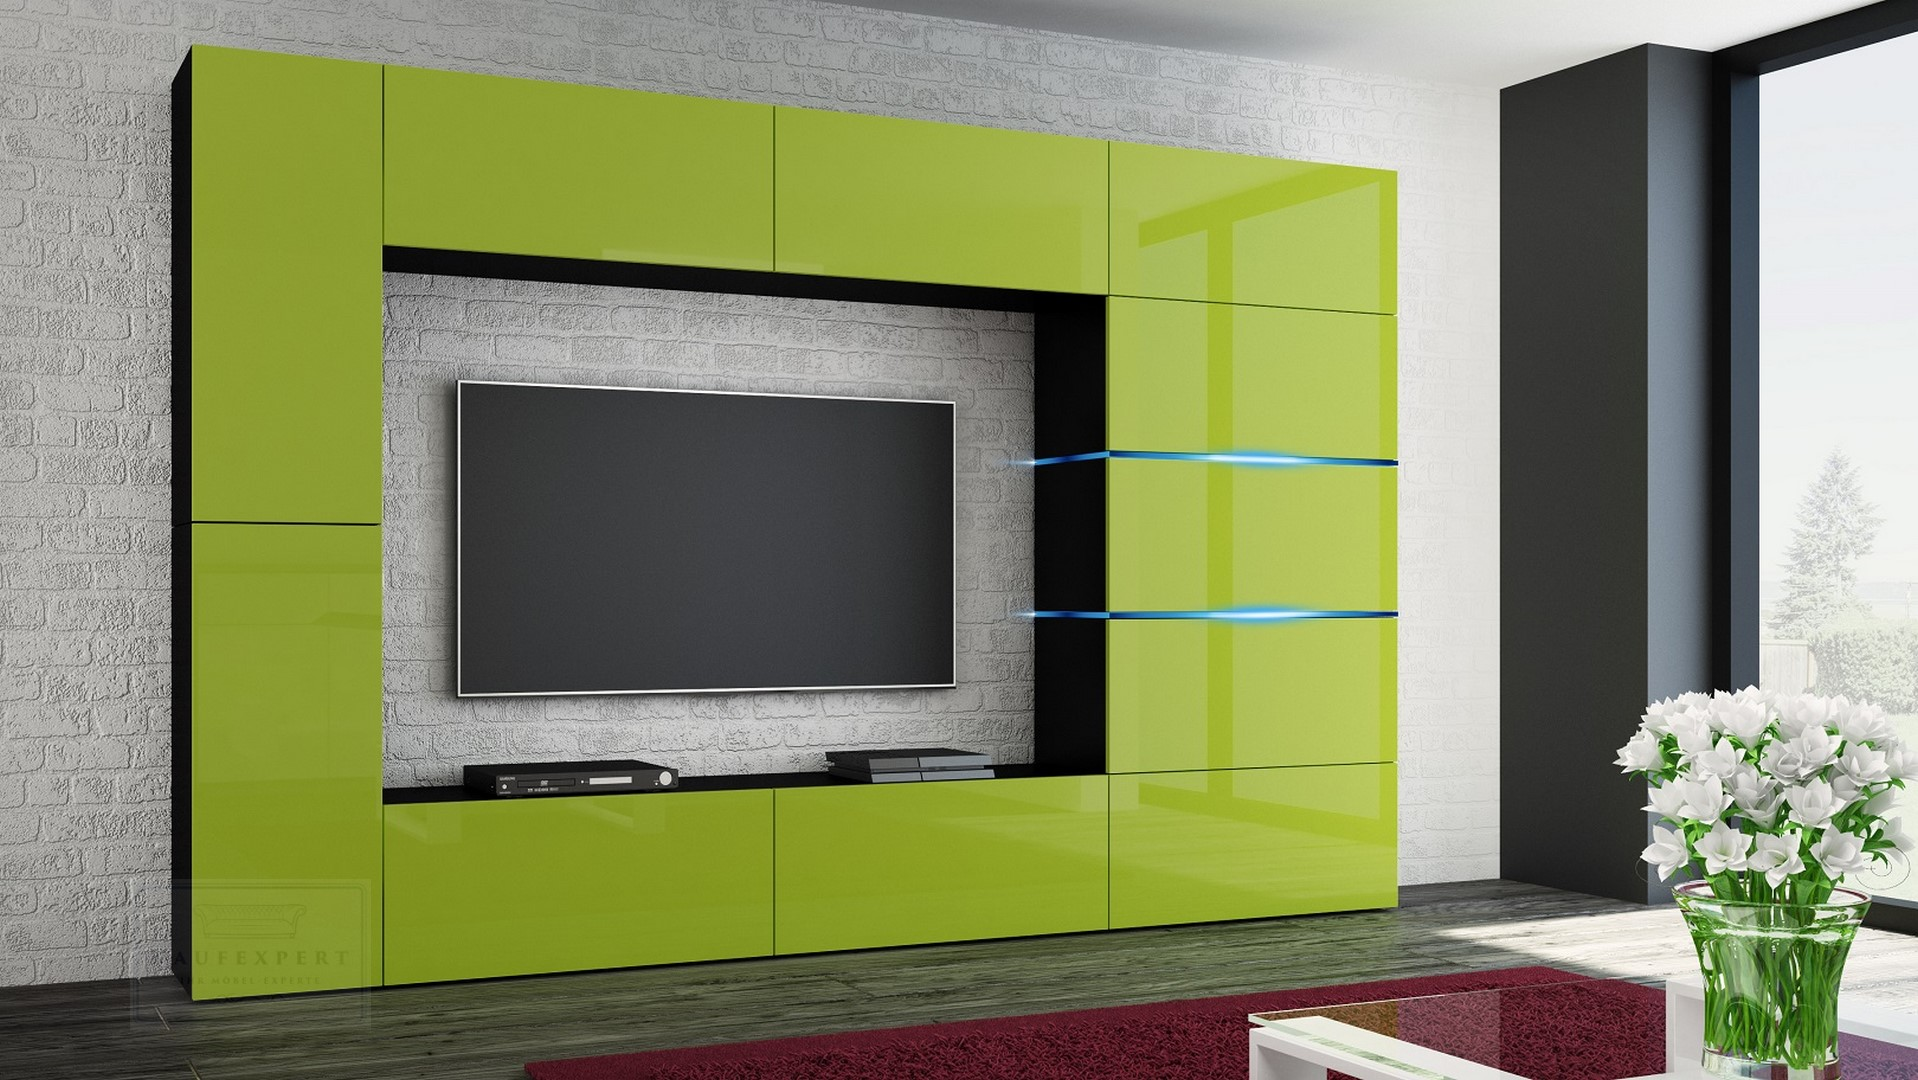 Wohnwand Shadow Lime Hochglanz/Schwarz 285 Cm Mediawand Anbauwand  Medienwand Design Modern Led Beleuchtung Hochglanz